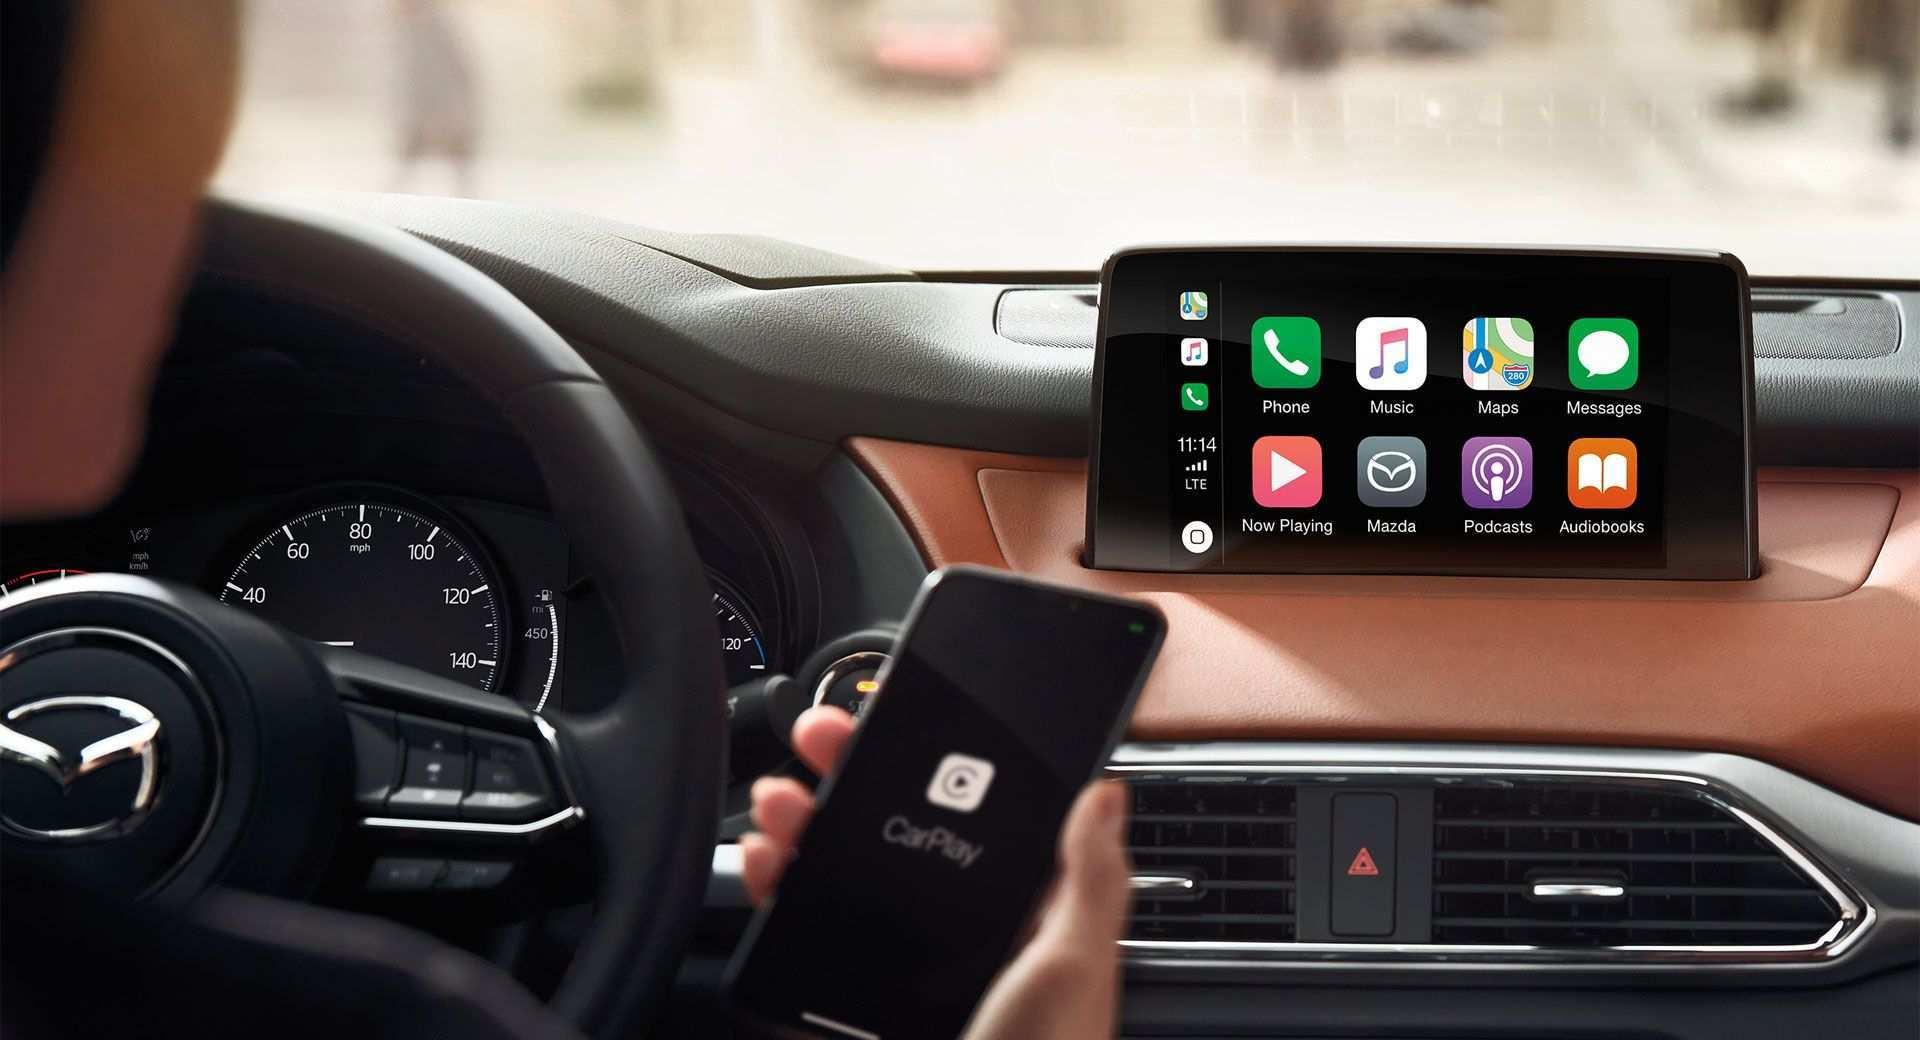 25 All New Mazda 2020 Apple Carplay Redesign with Mazda 2020 Apple Carplay